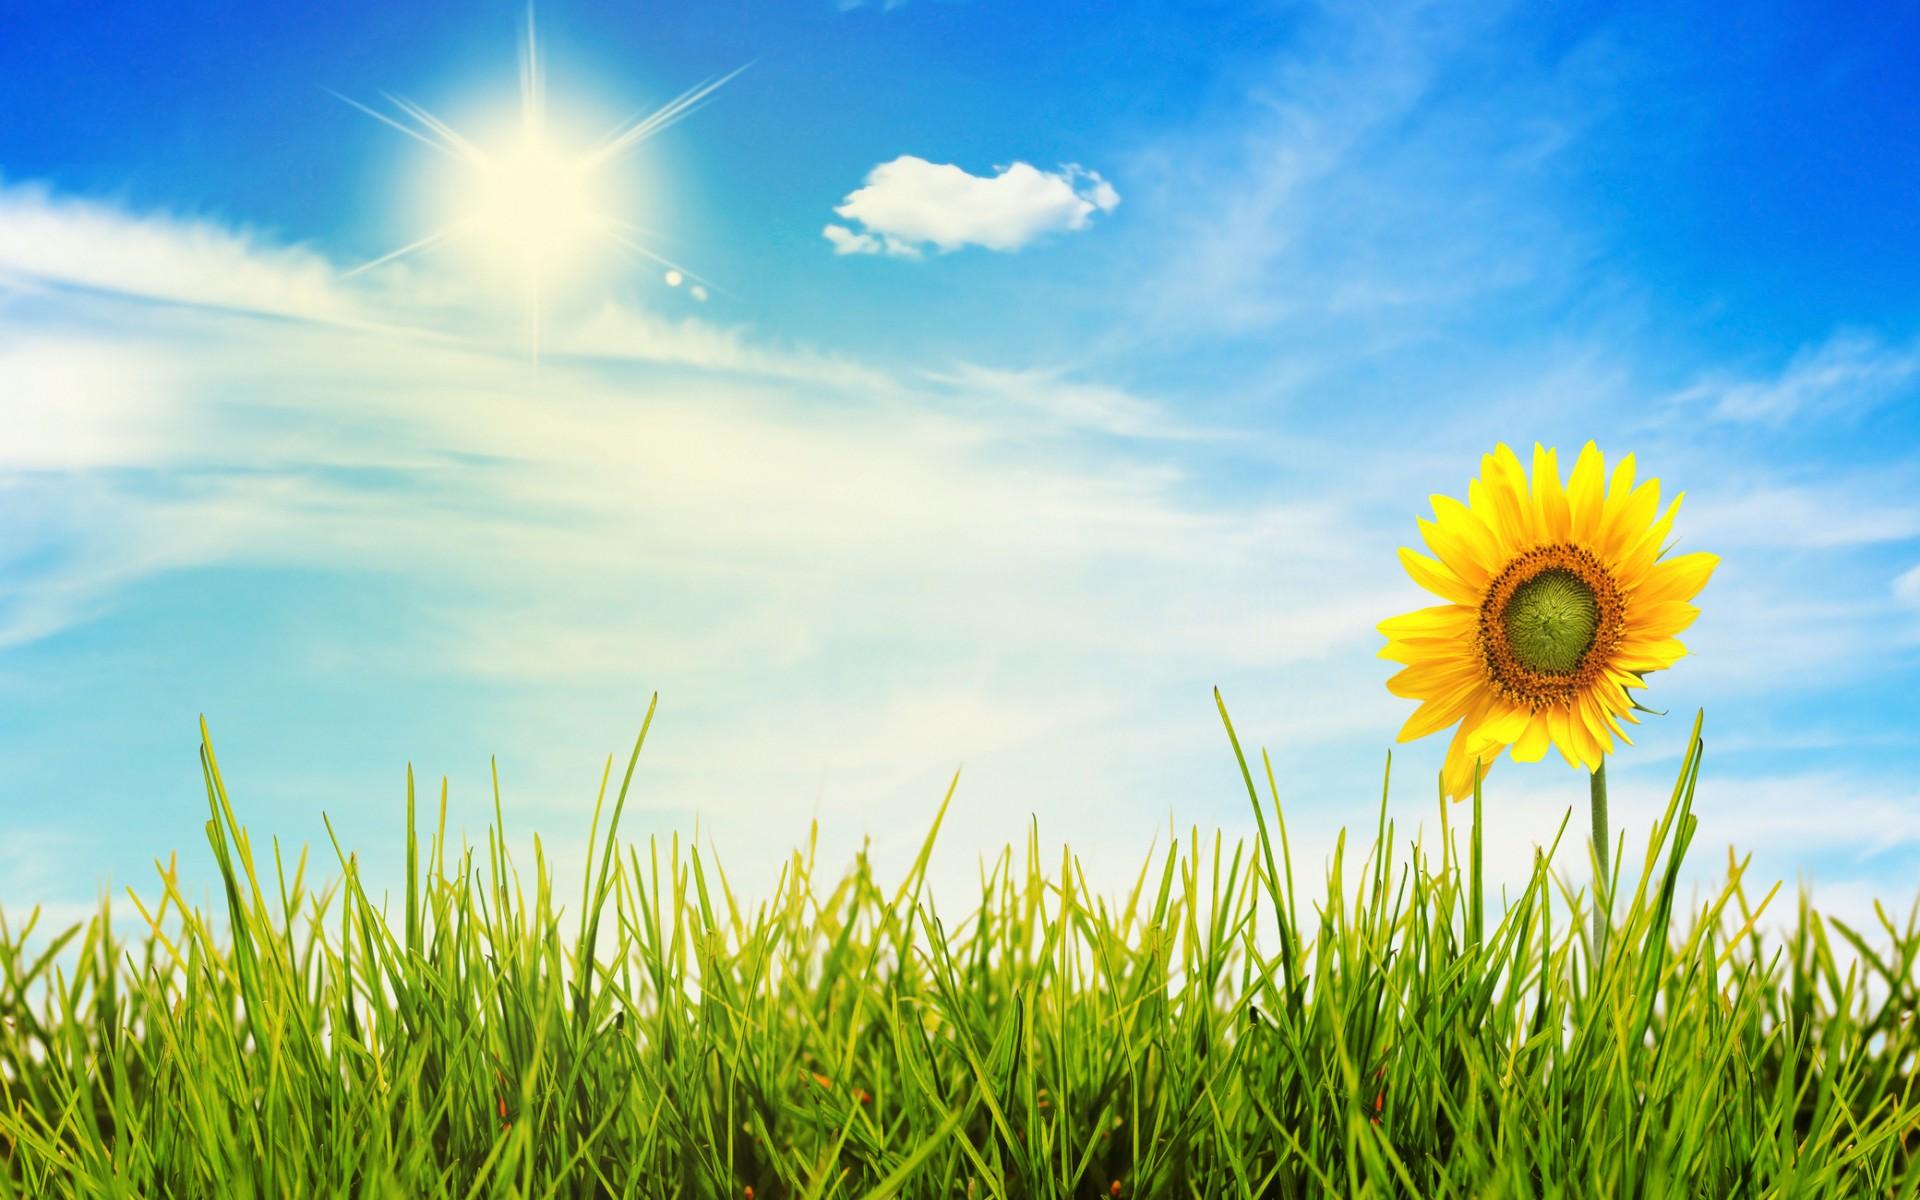 Sunny Day Wallpaper Desktop